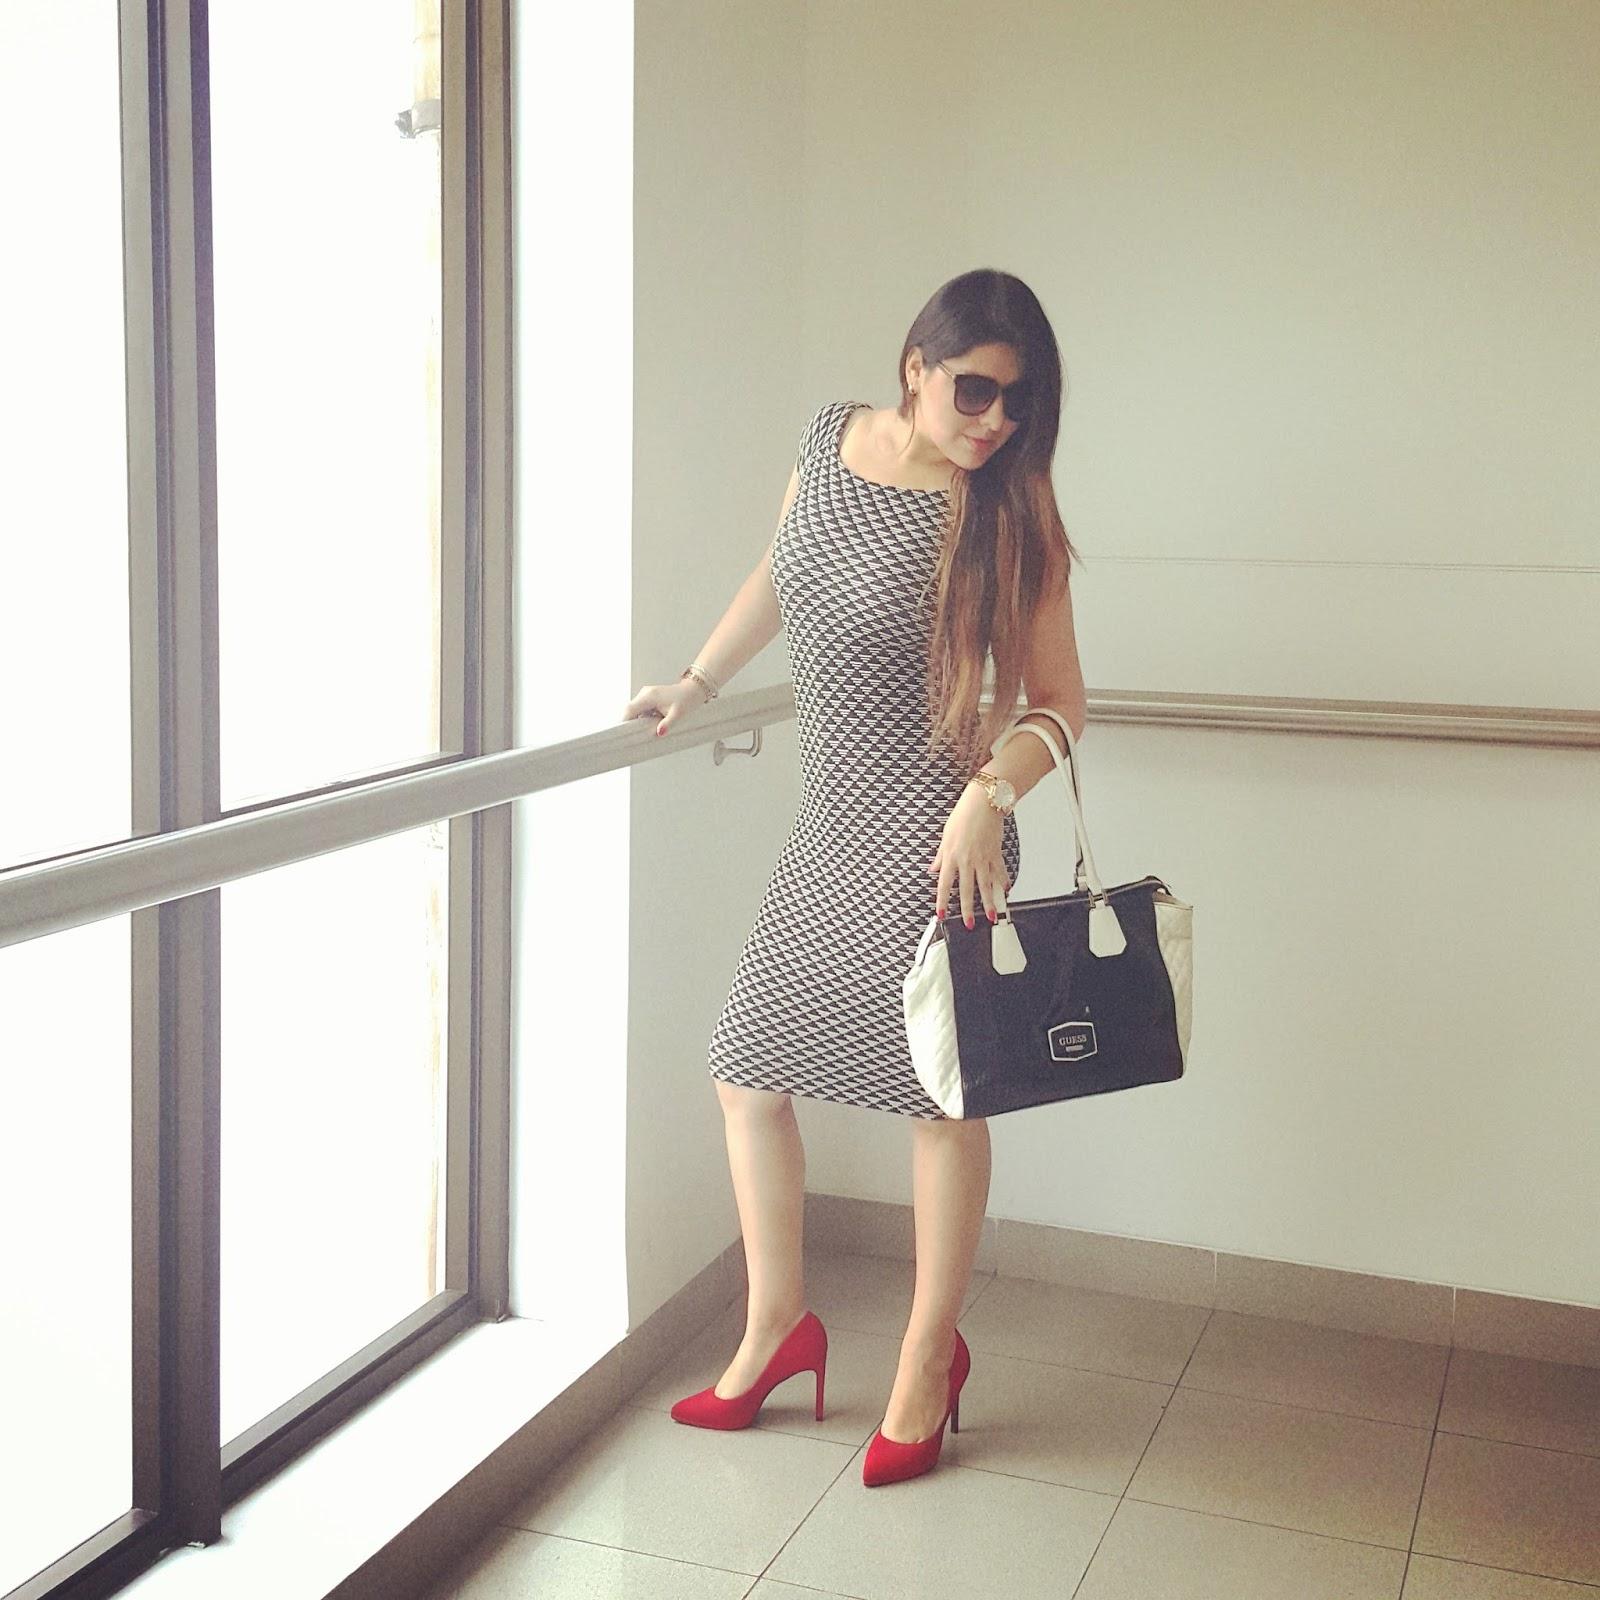 Zapatos para vestido negro con rayas blancas